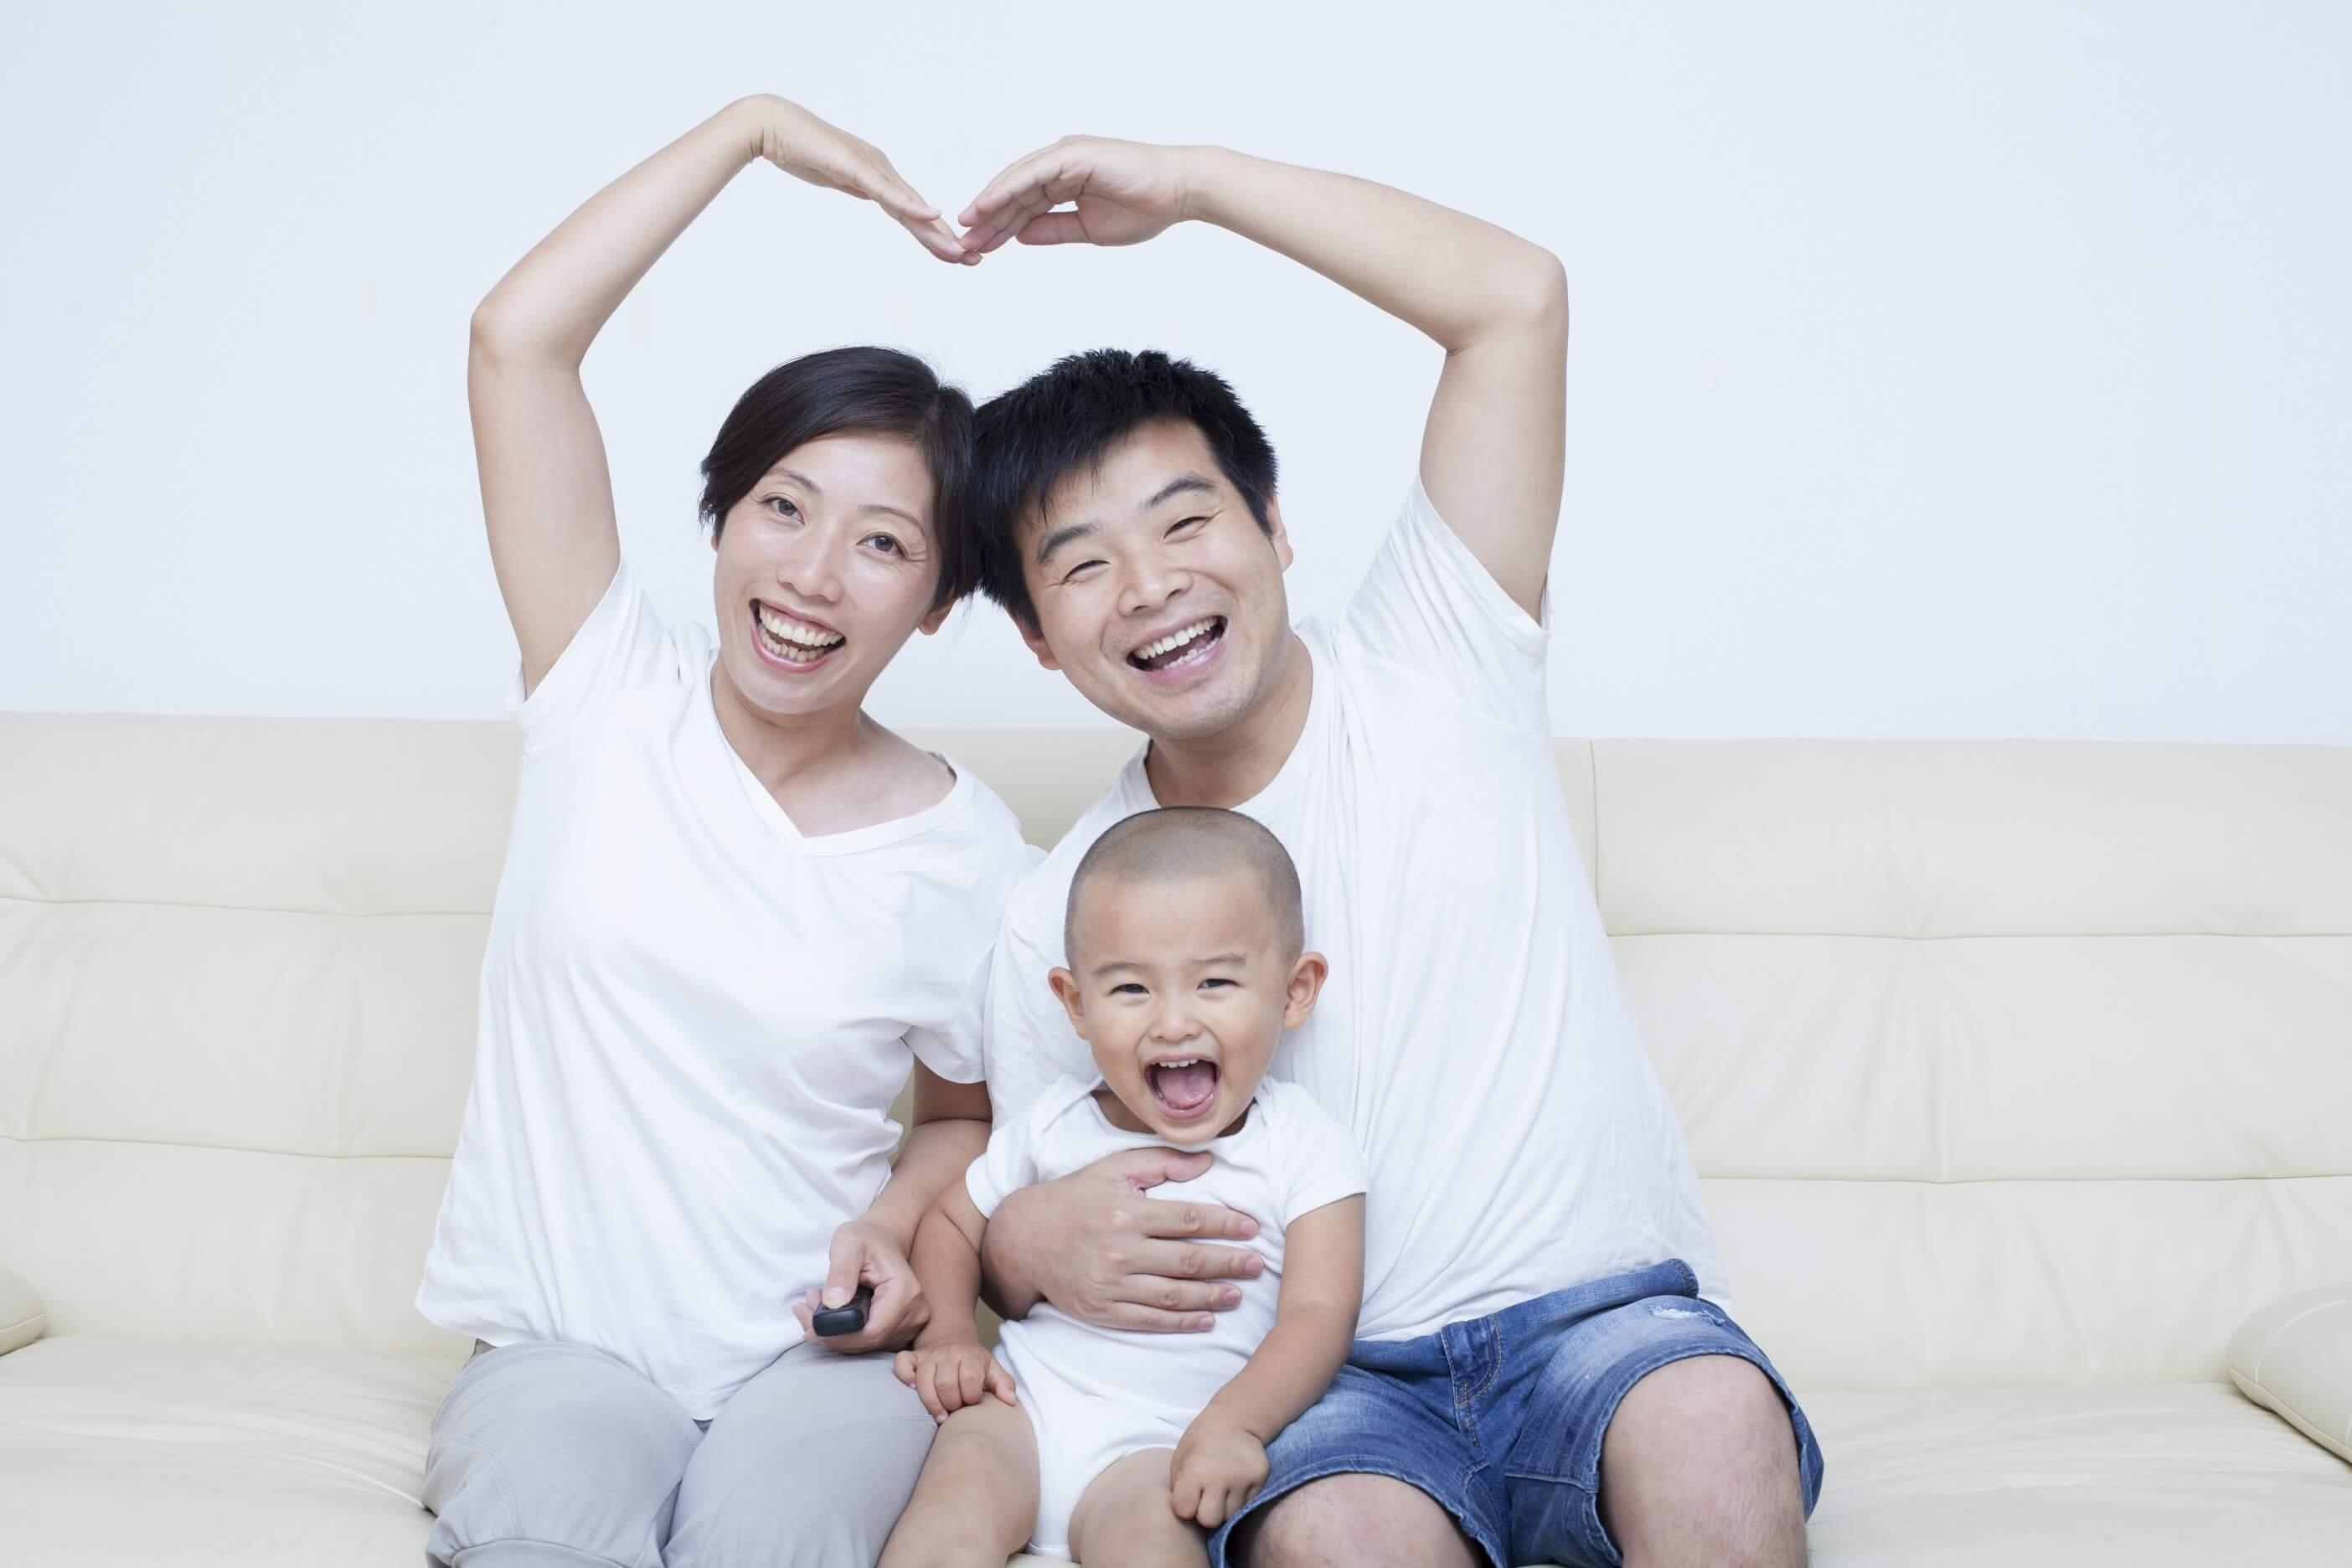 bayi-usia-18-bulan-si-kecil-penuh_energi-header-image.jpg